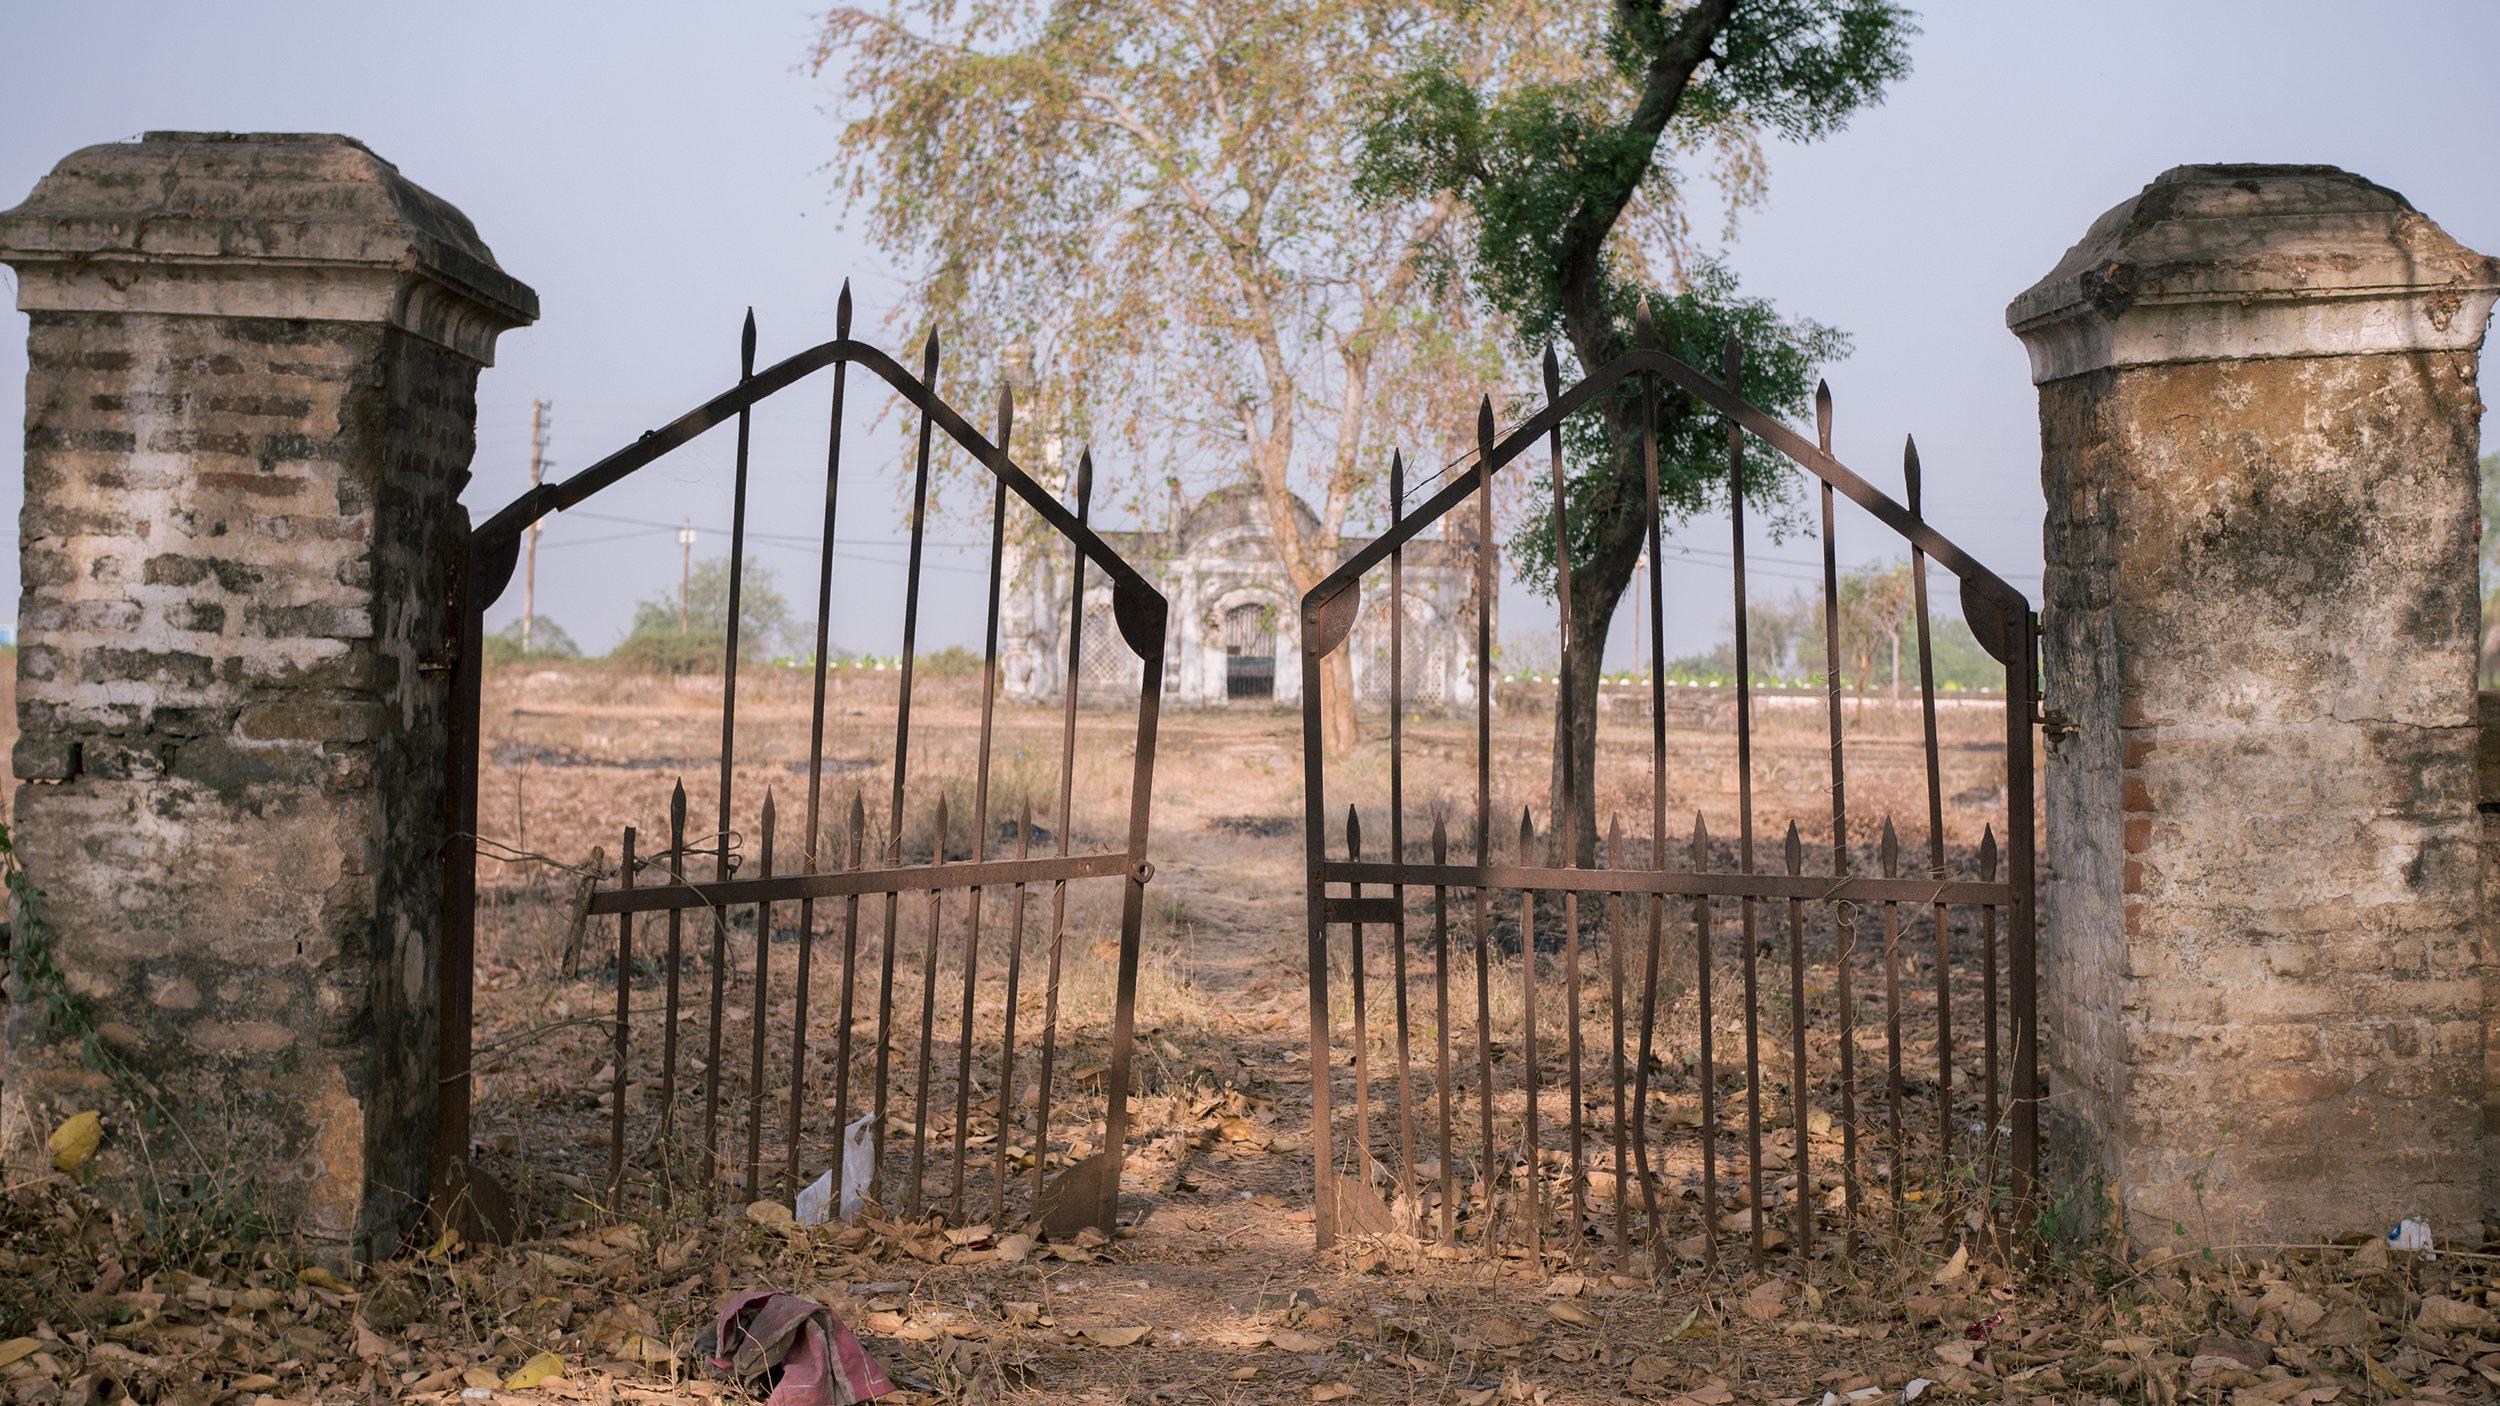 The gates of the Nizam Bagh